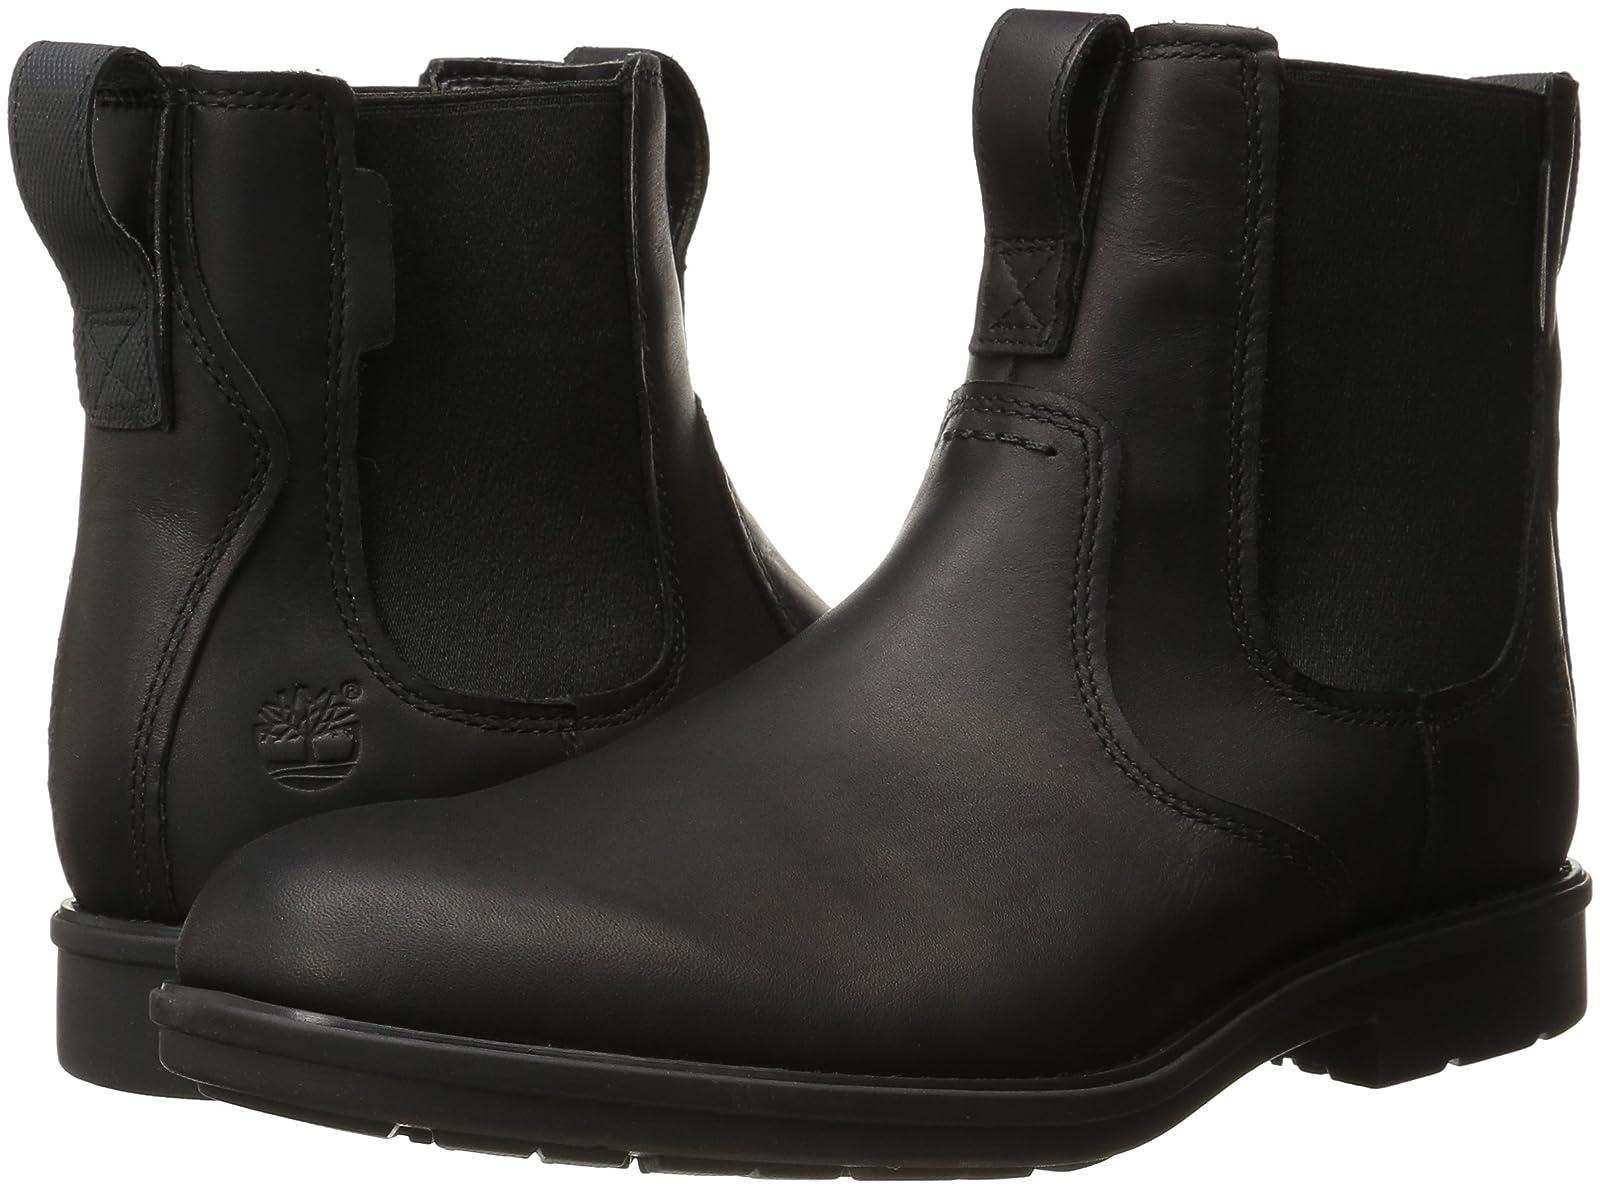 Timberland Men's Carter Notch PT Chelsea Boot 8 M US - 6